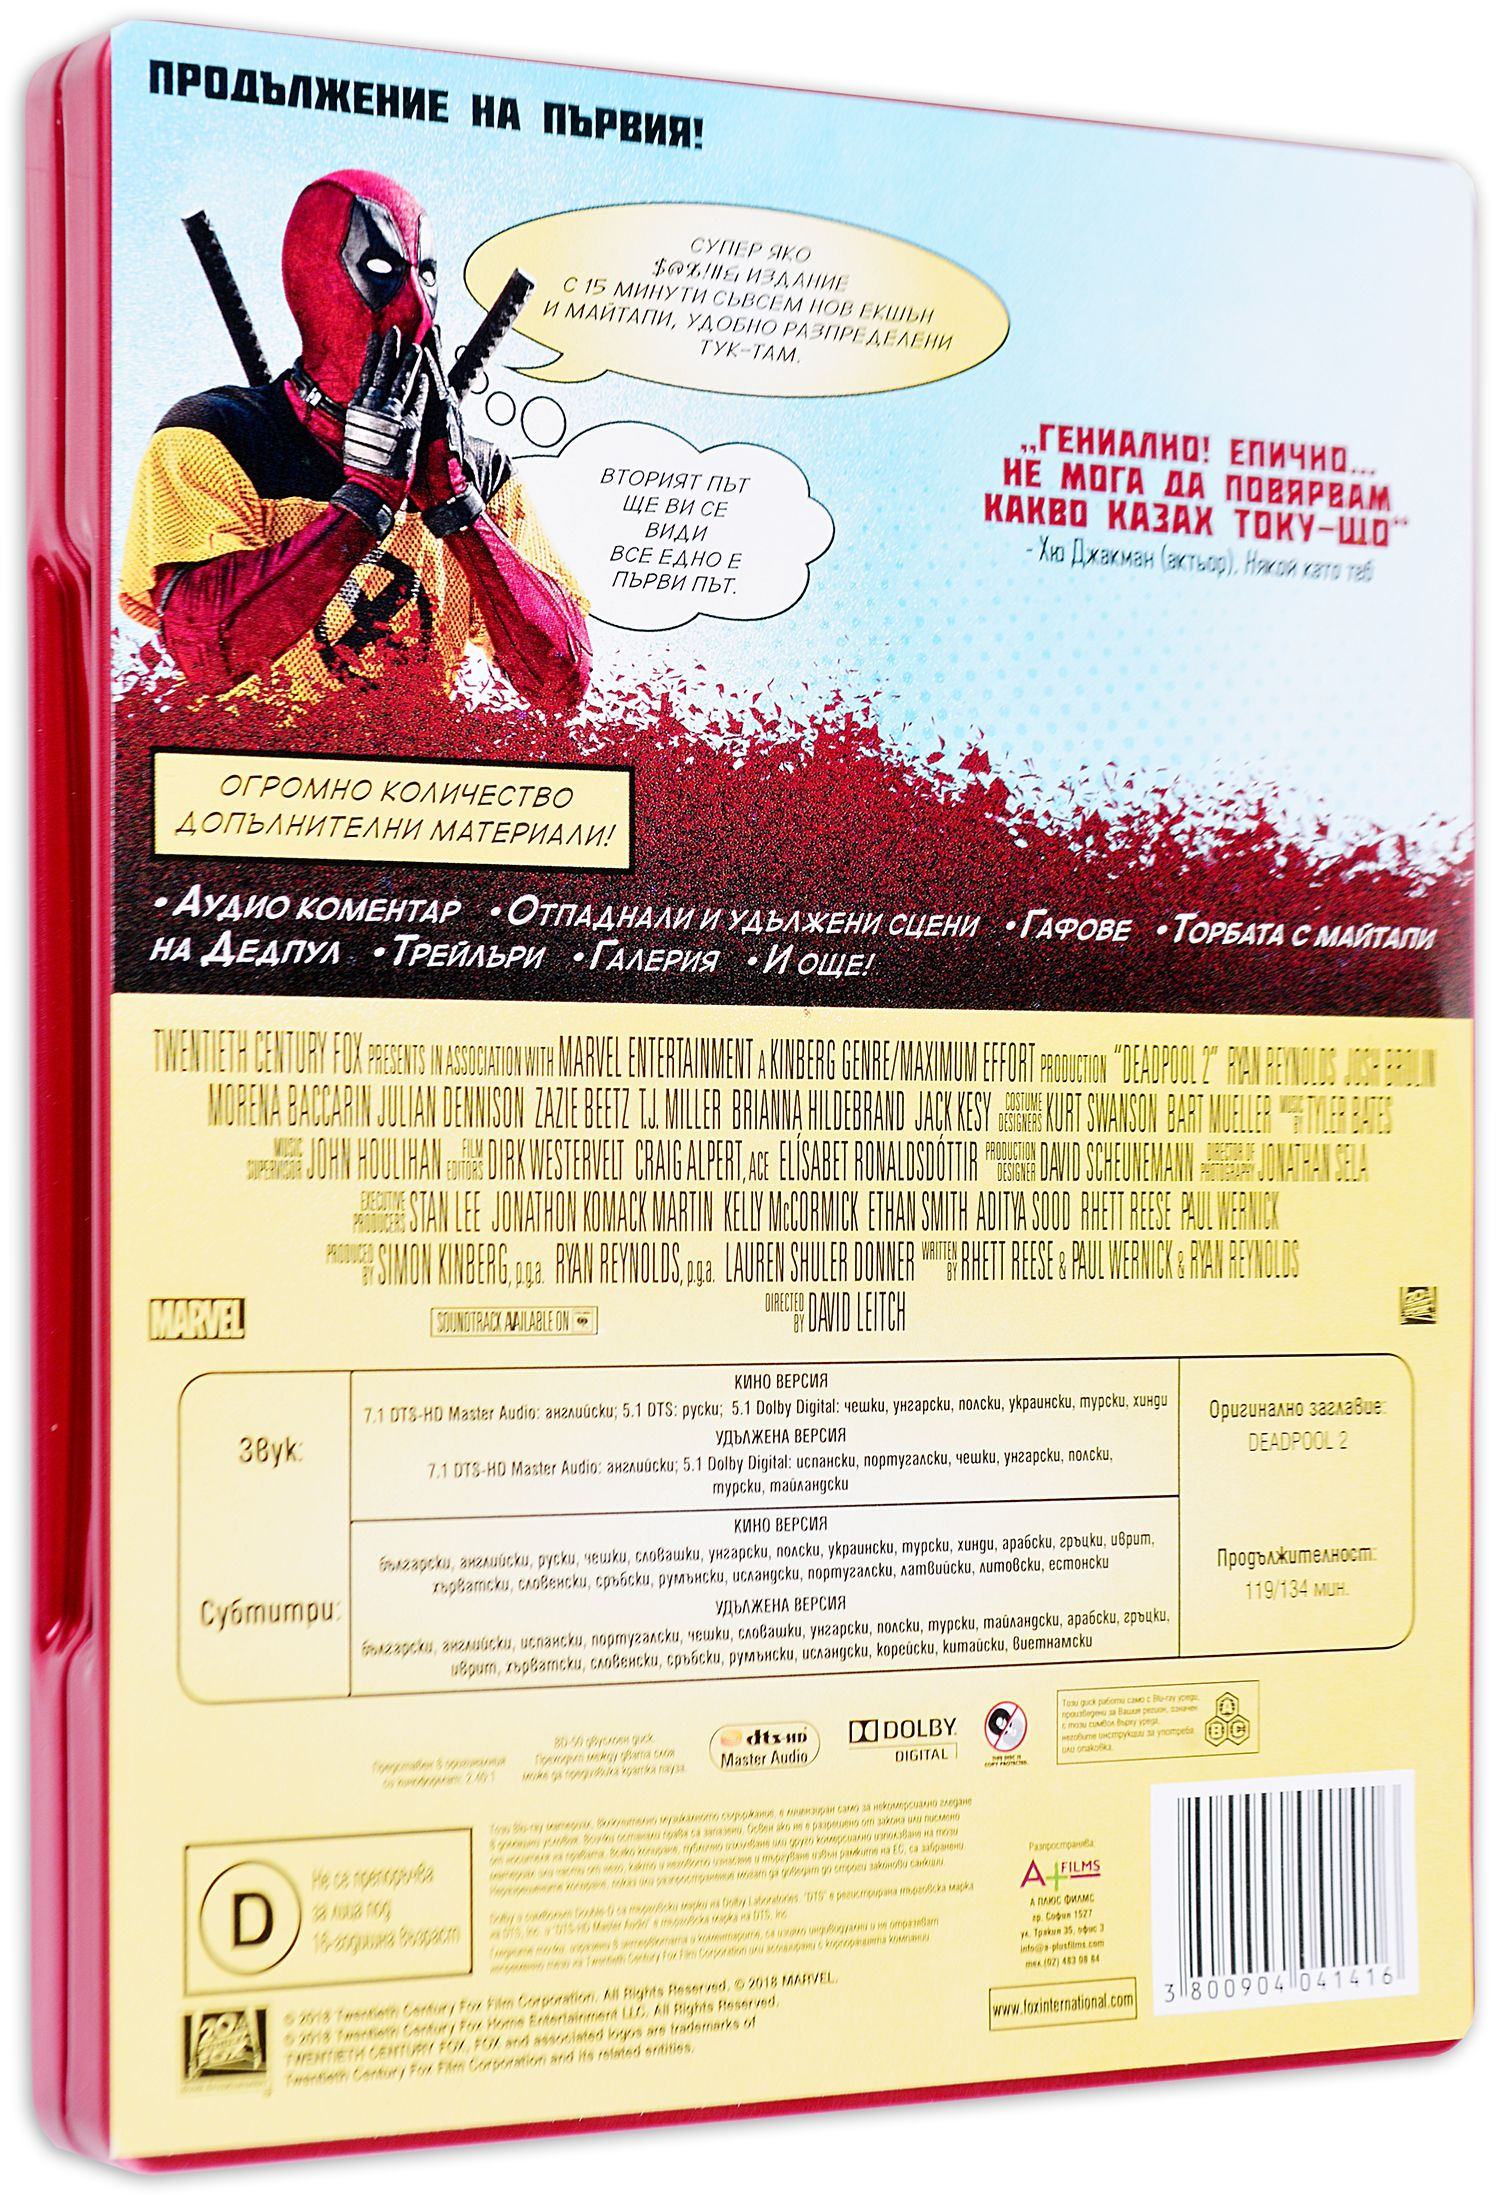 Дедпул 2 (Steelbook Edition) - 5